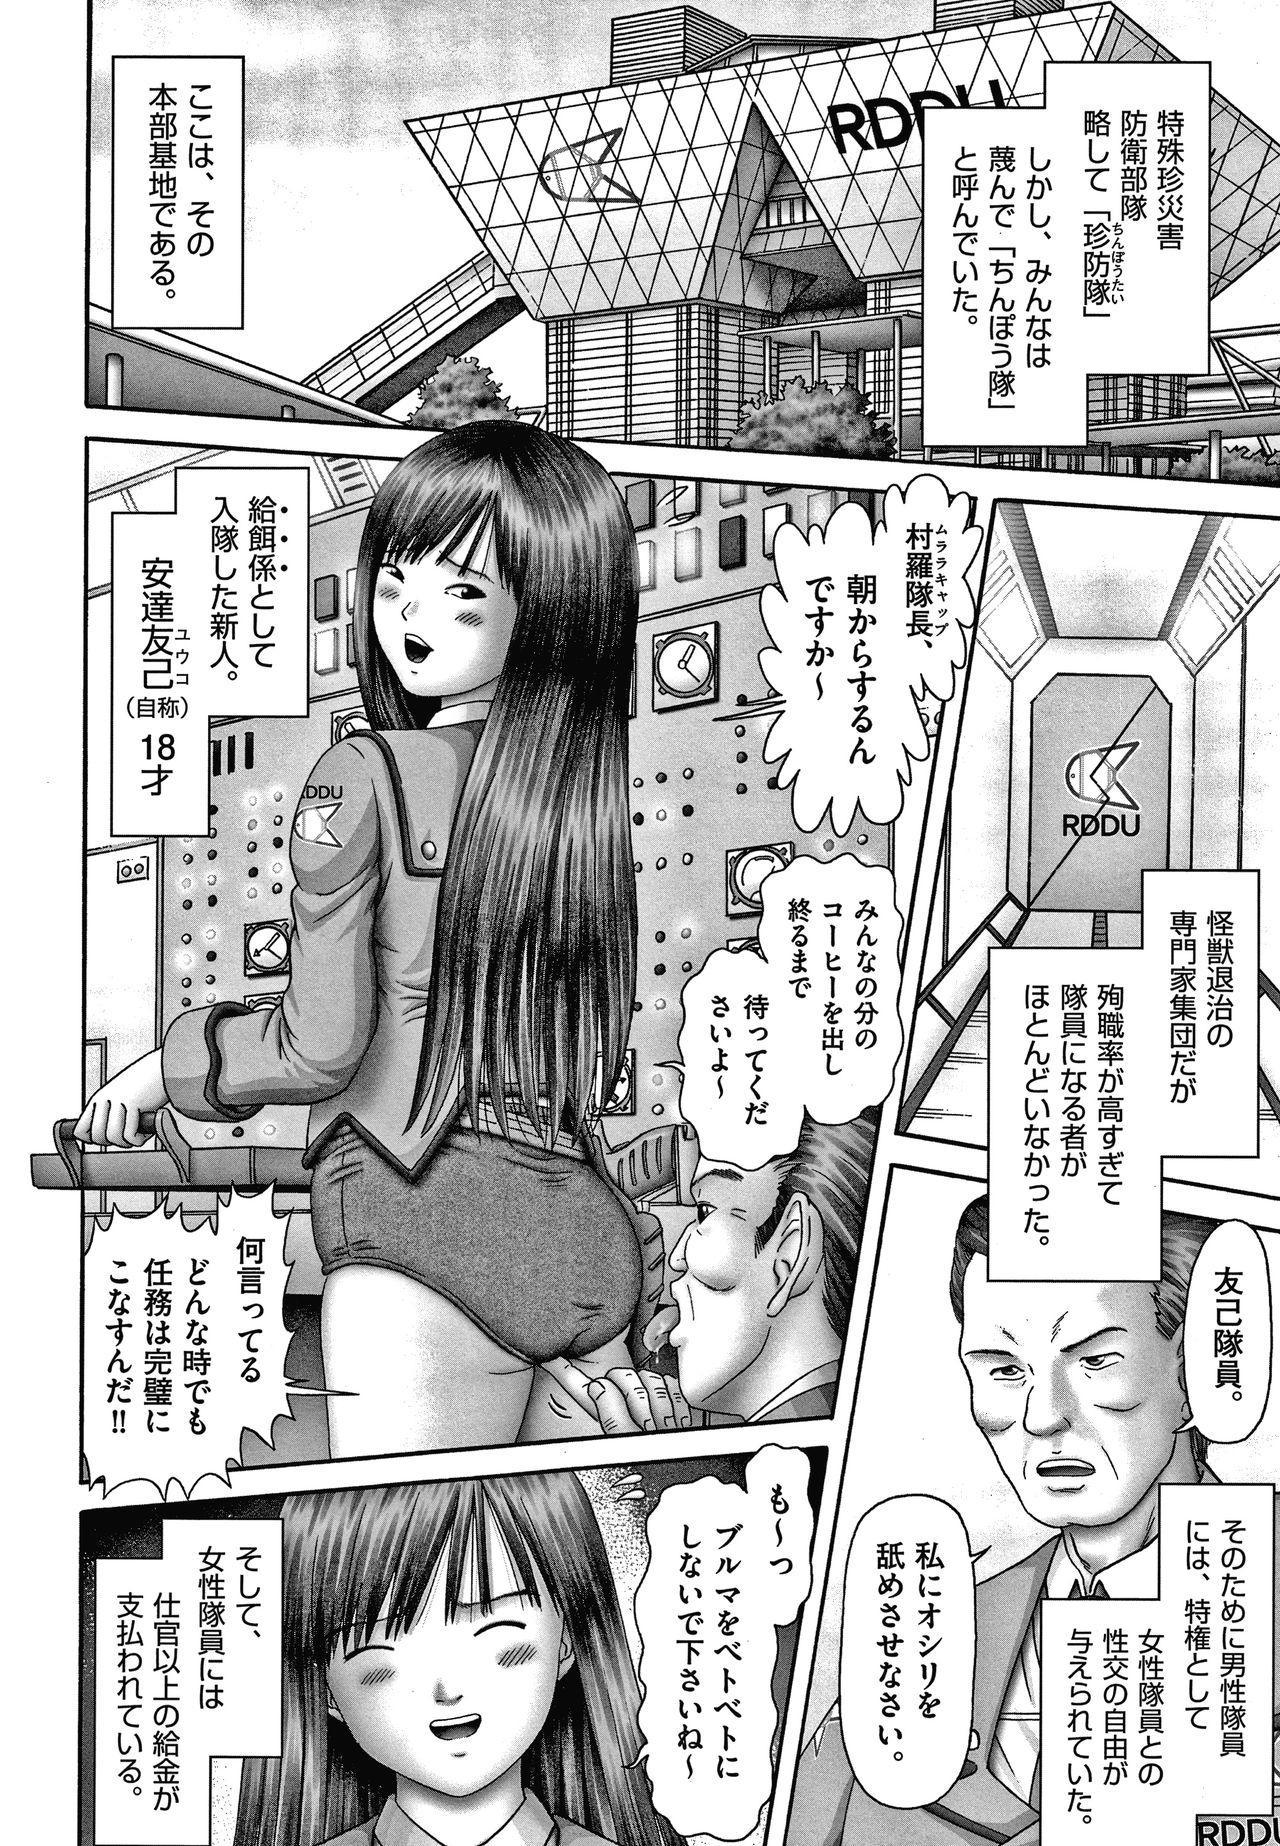 Shoujo Kumikyoku 15 66